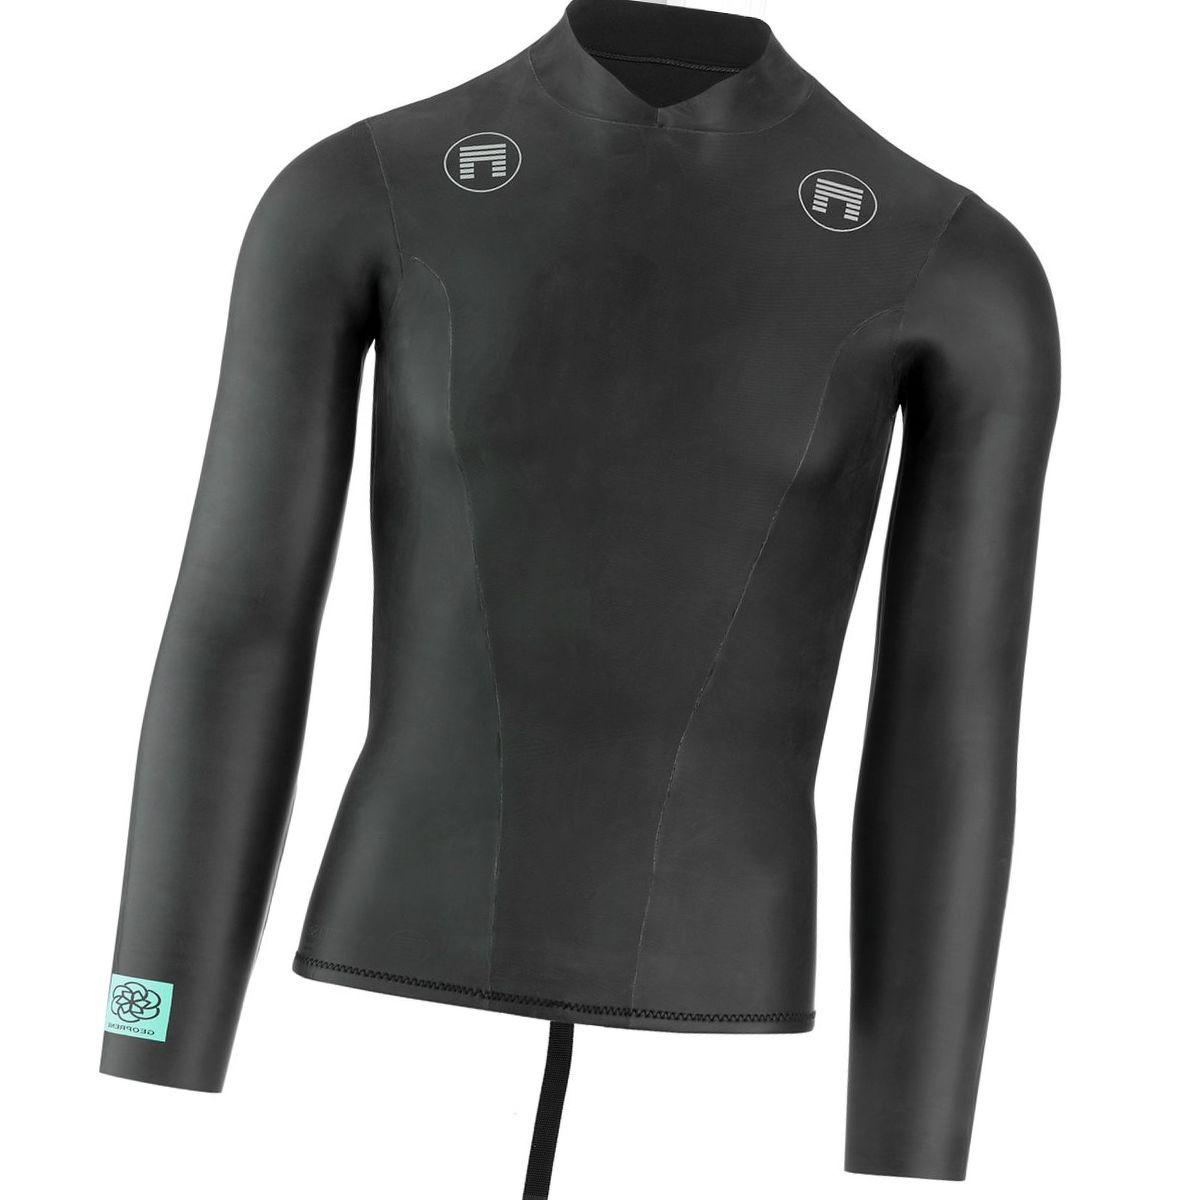 Matuse Chapter 1 Wetsuit Jacket - Men's